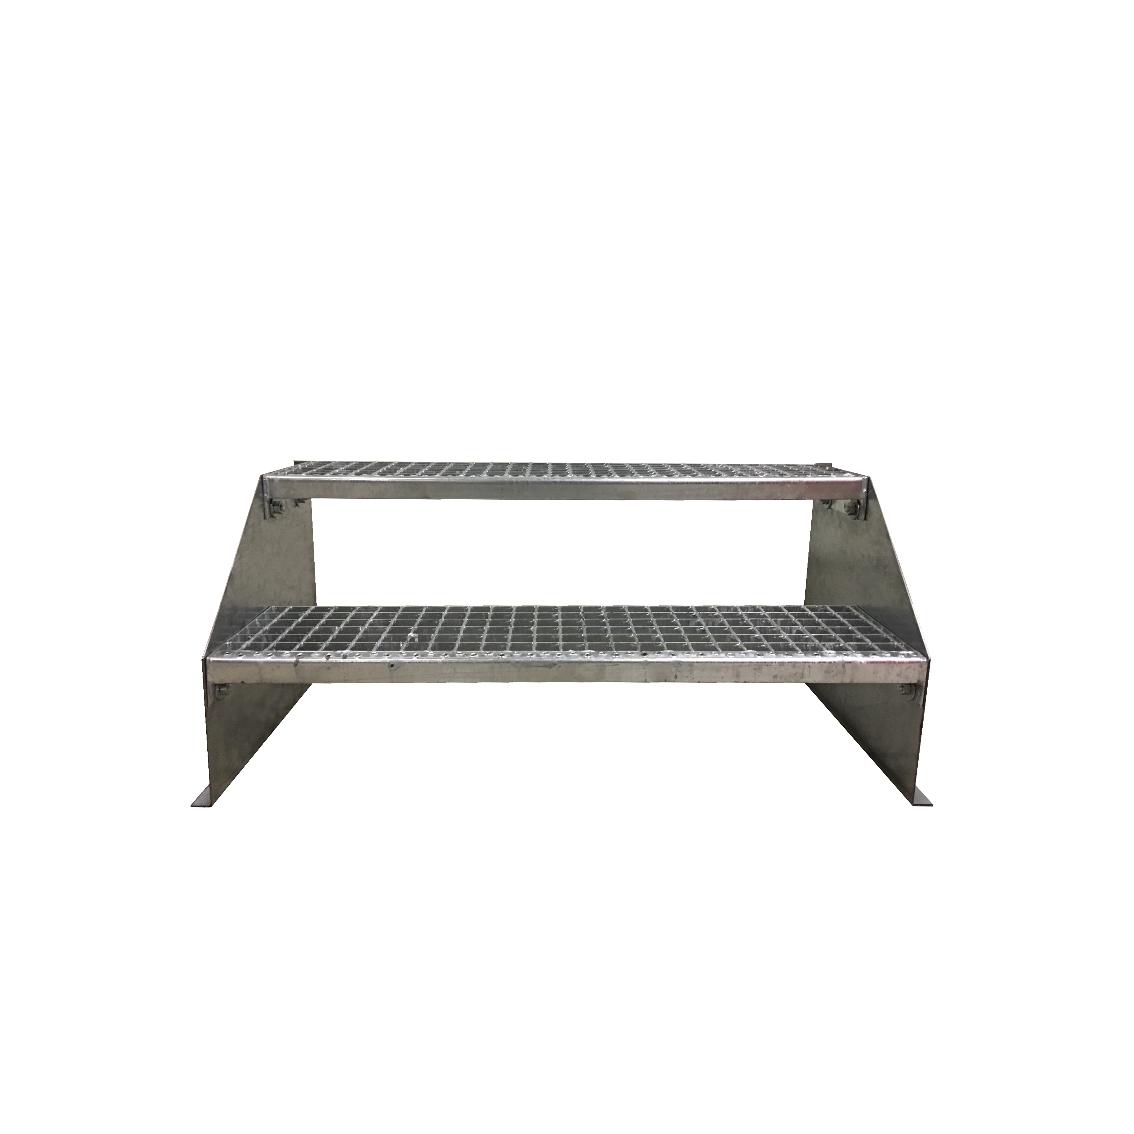 Favorit 2-stufige Stahltreppe freistehend / Standtreppe / Breite 70cm OV91